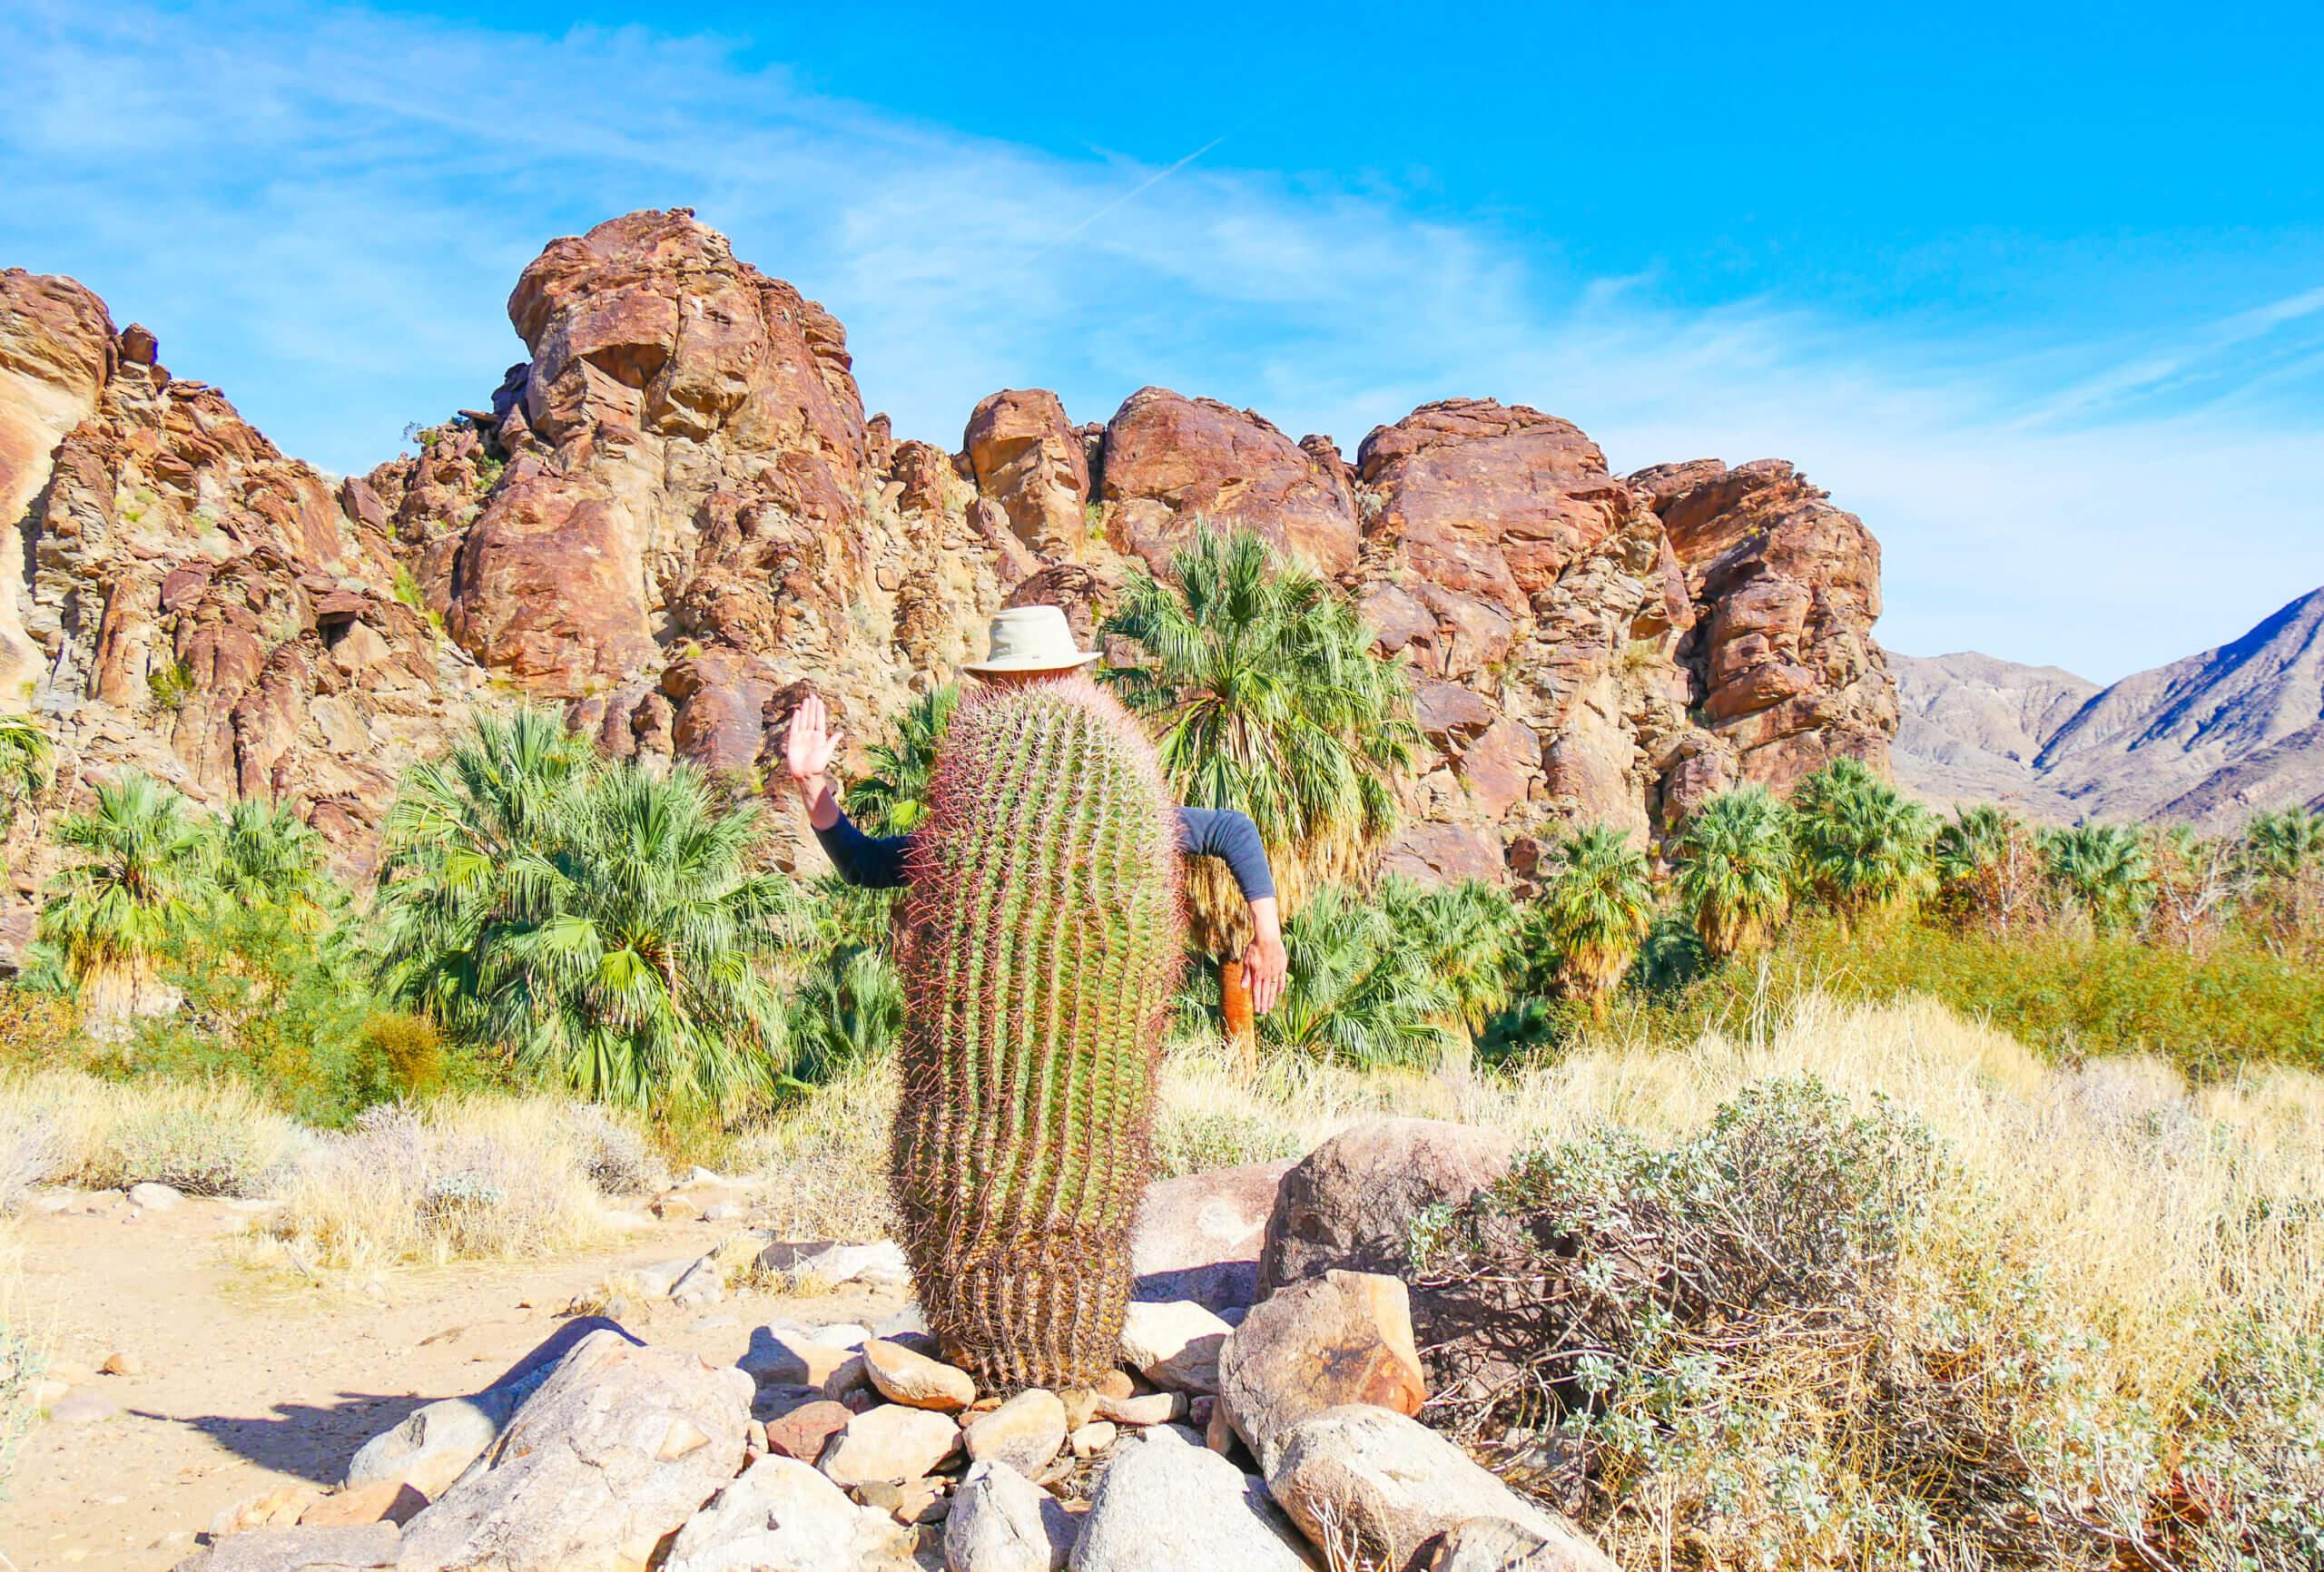 Cactus désert californien Indian Canyon Palm Springs